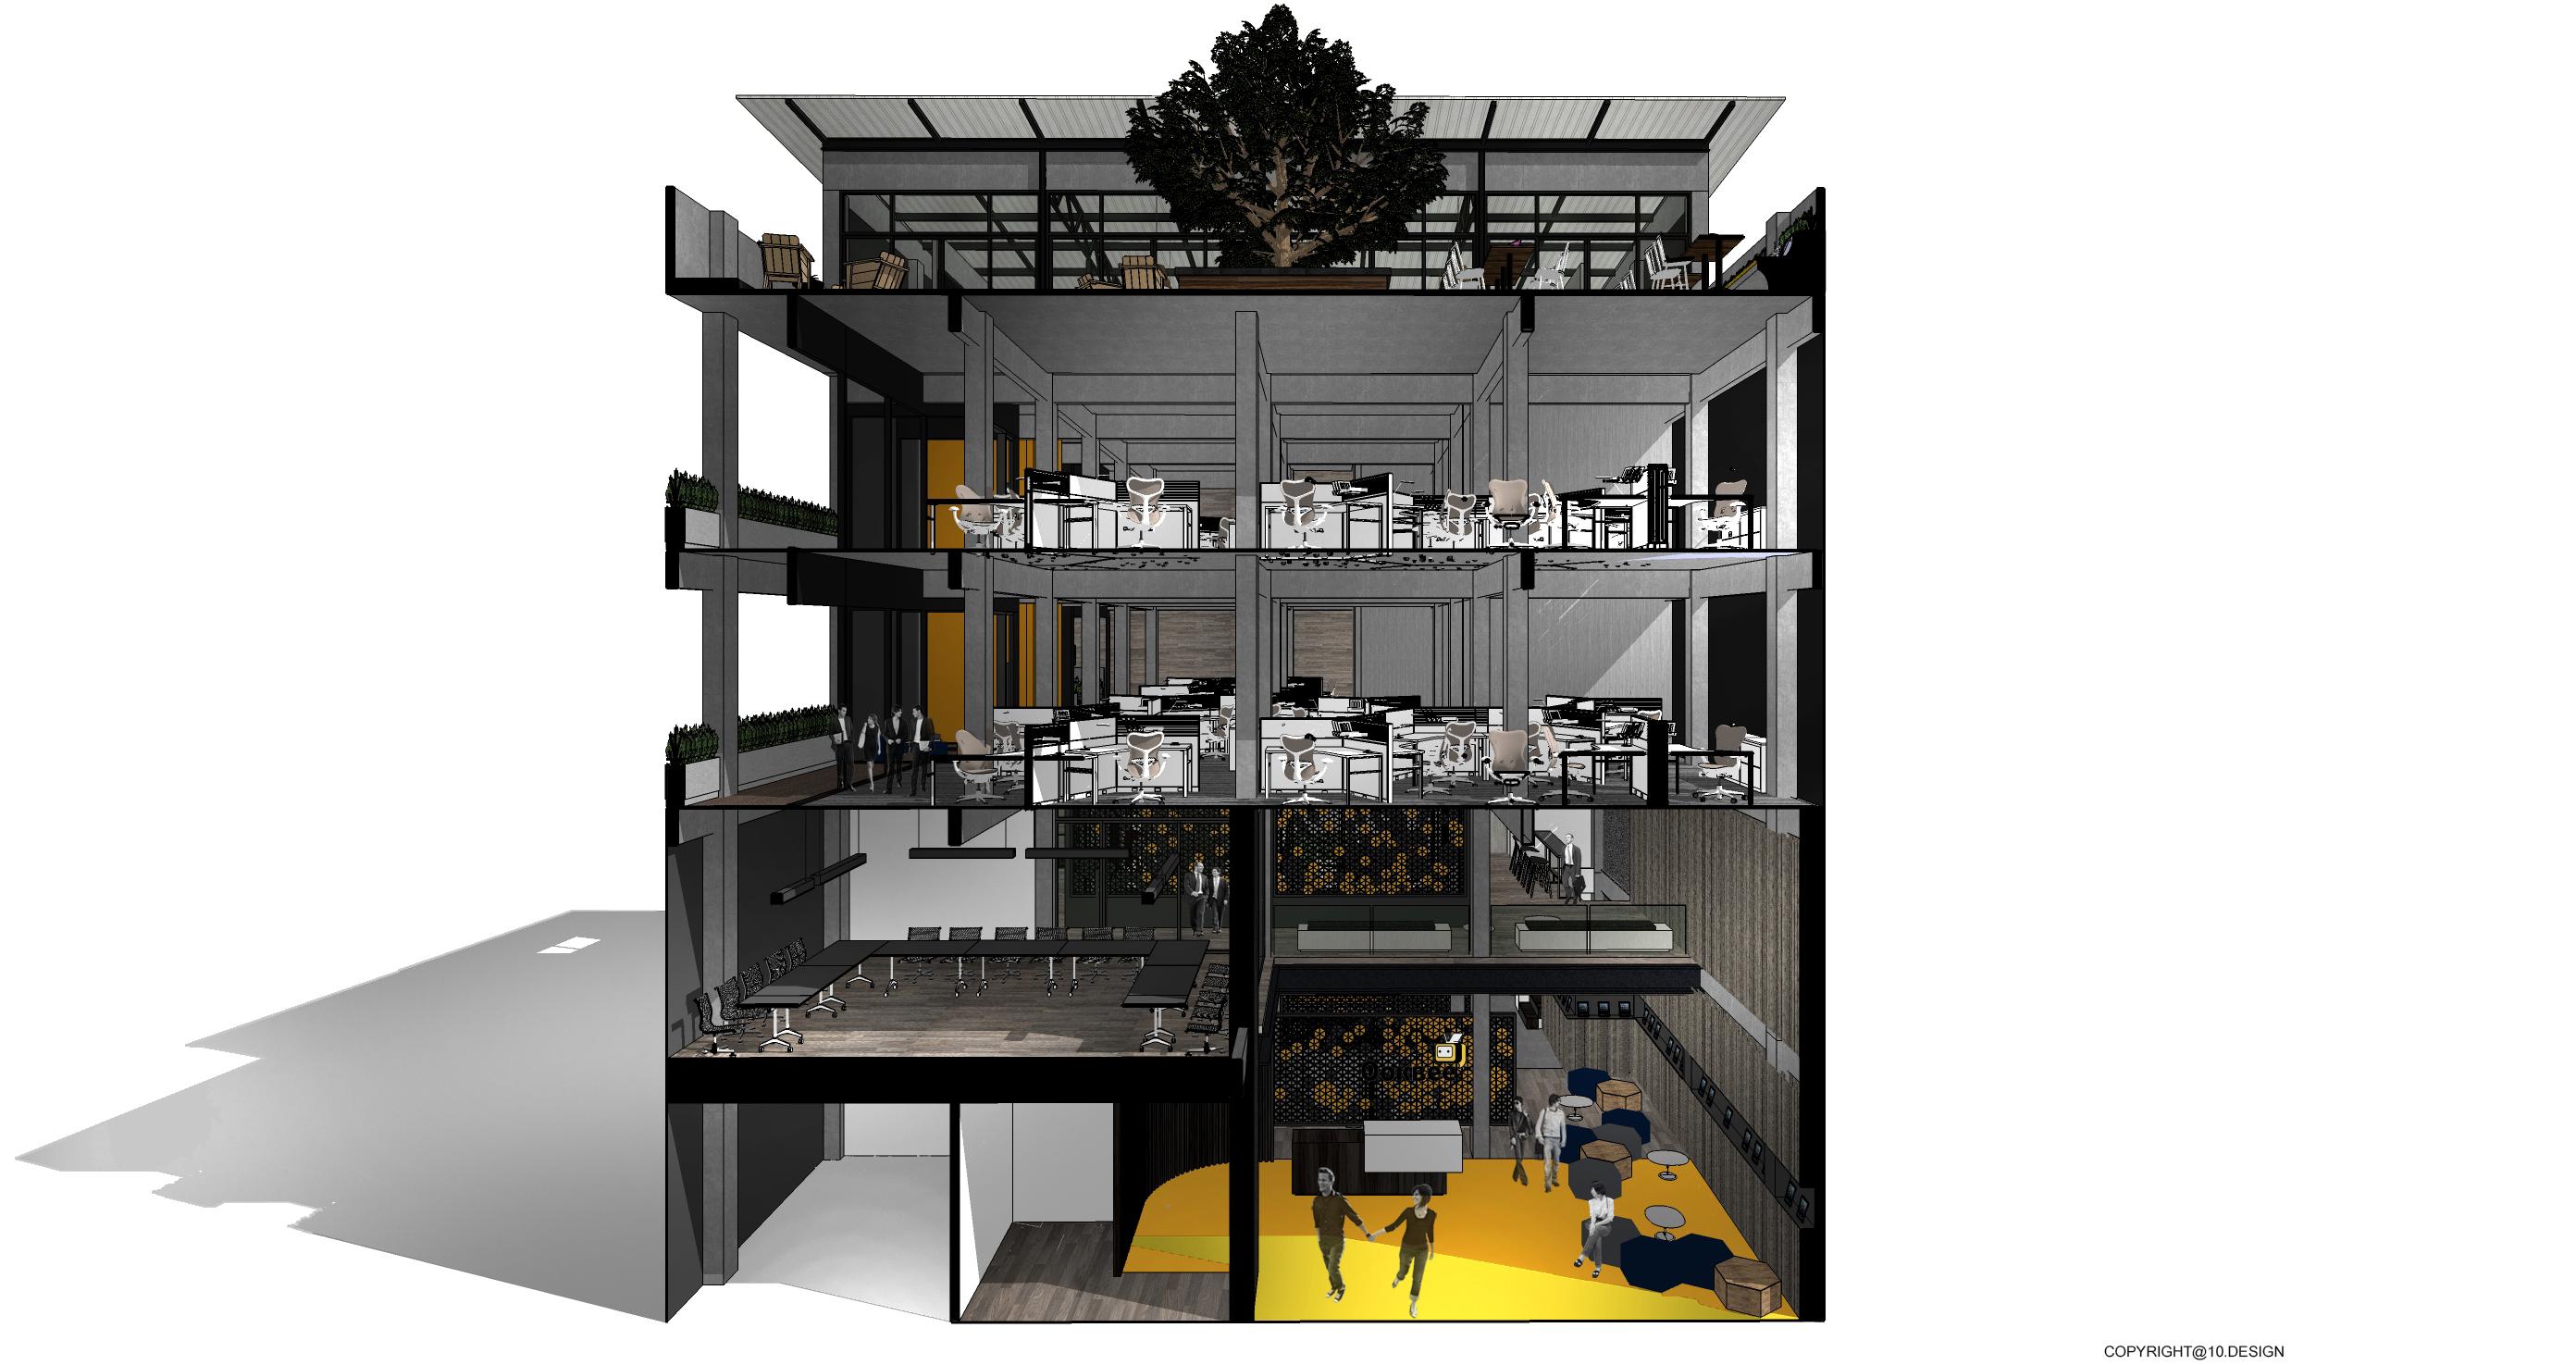 10DESIGN ookbee head office interior design start up THAILAND 04